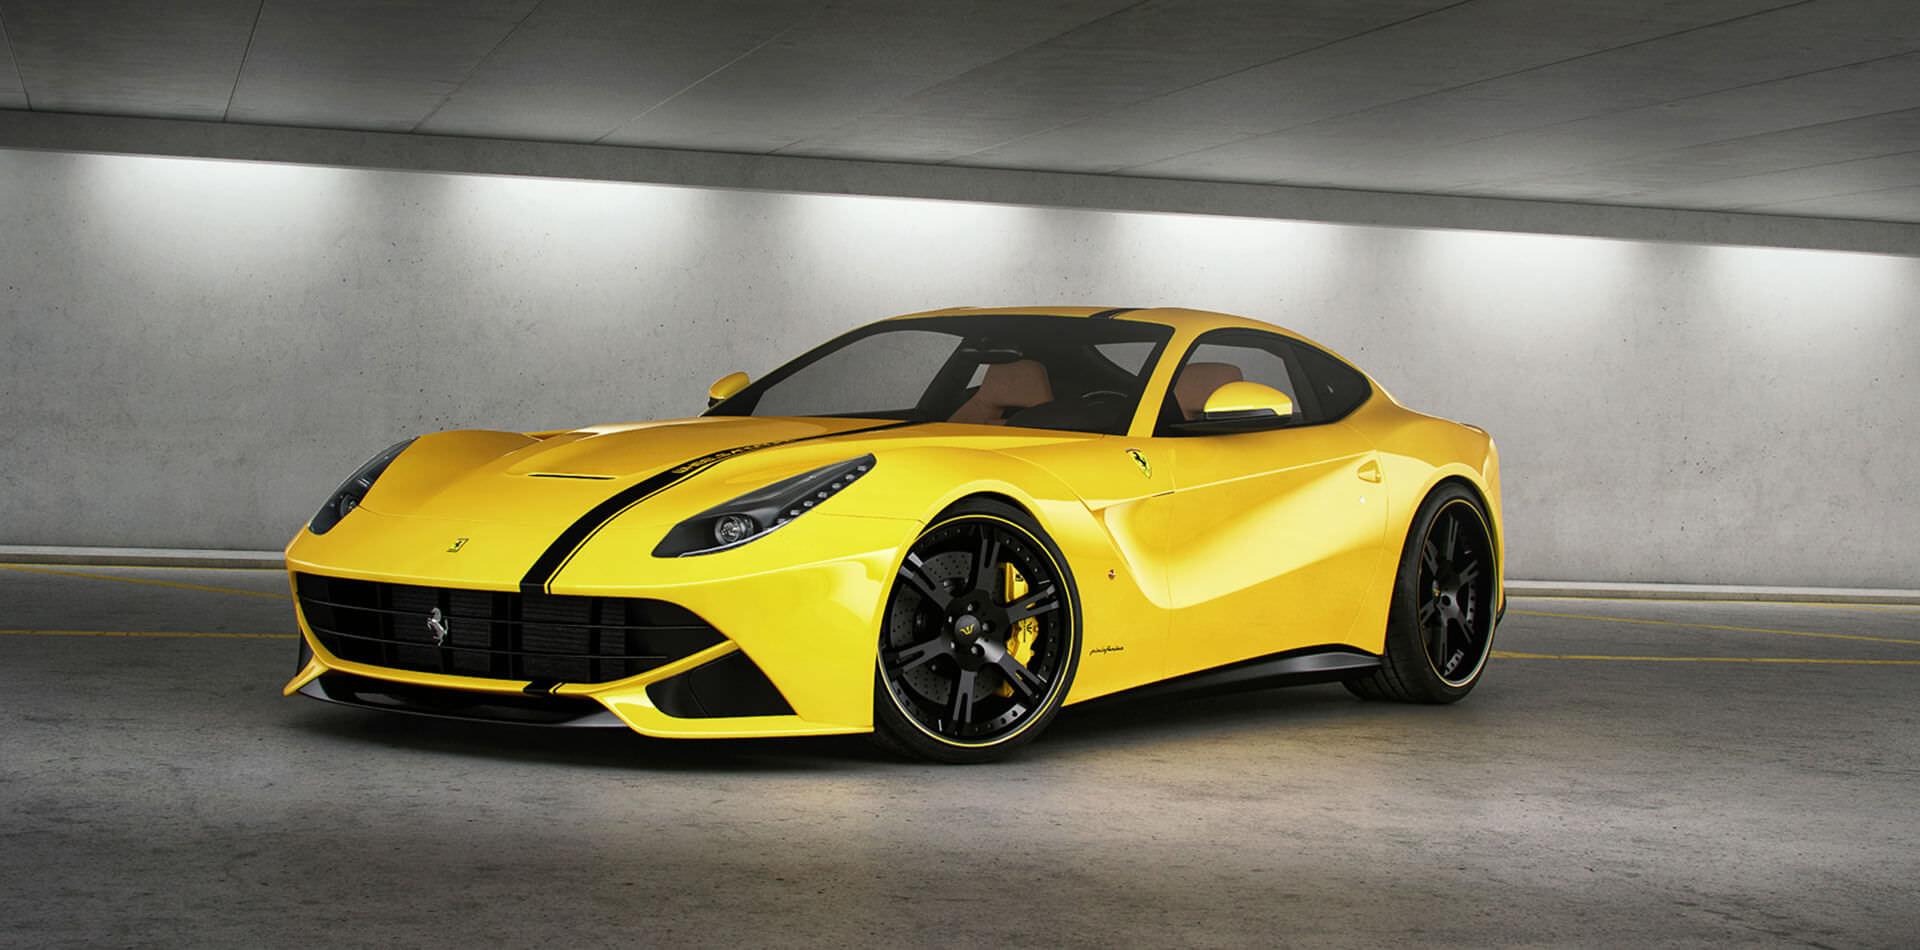 Ferrari F12 Tuning Felgen Auspuffanlage Wheelsandmore